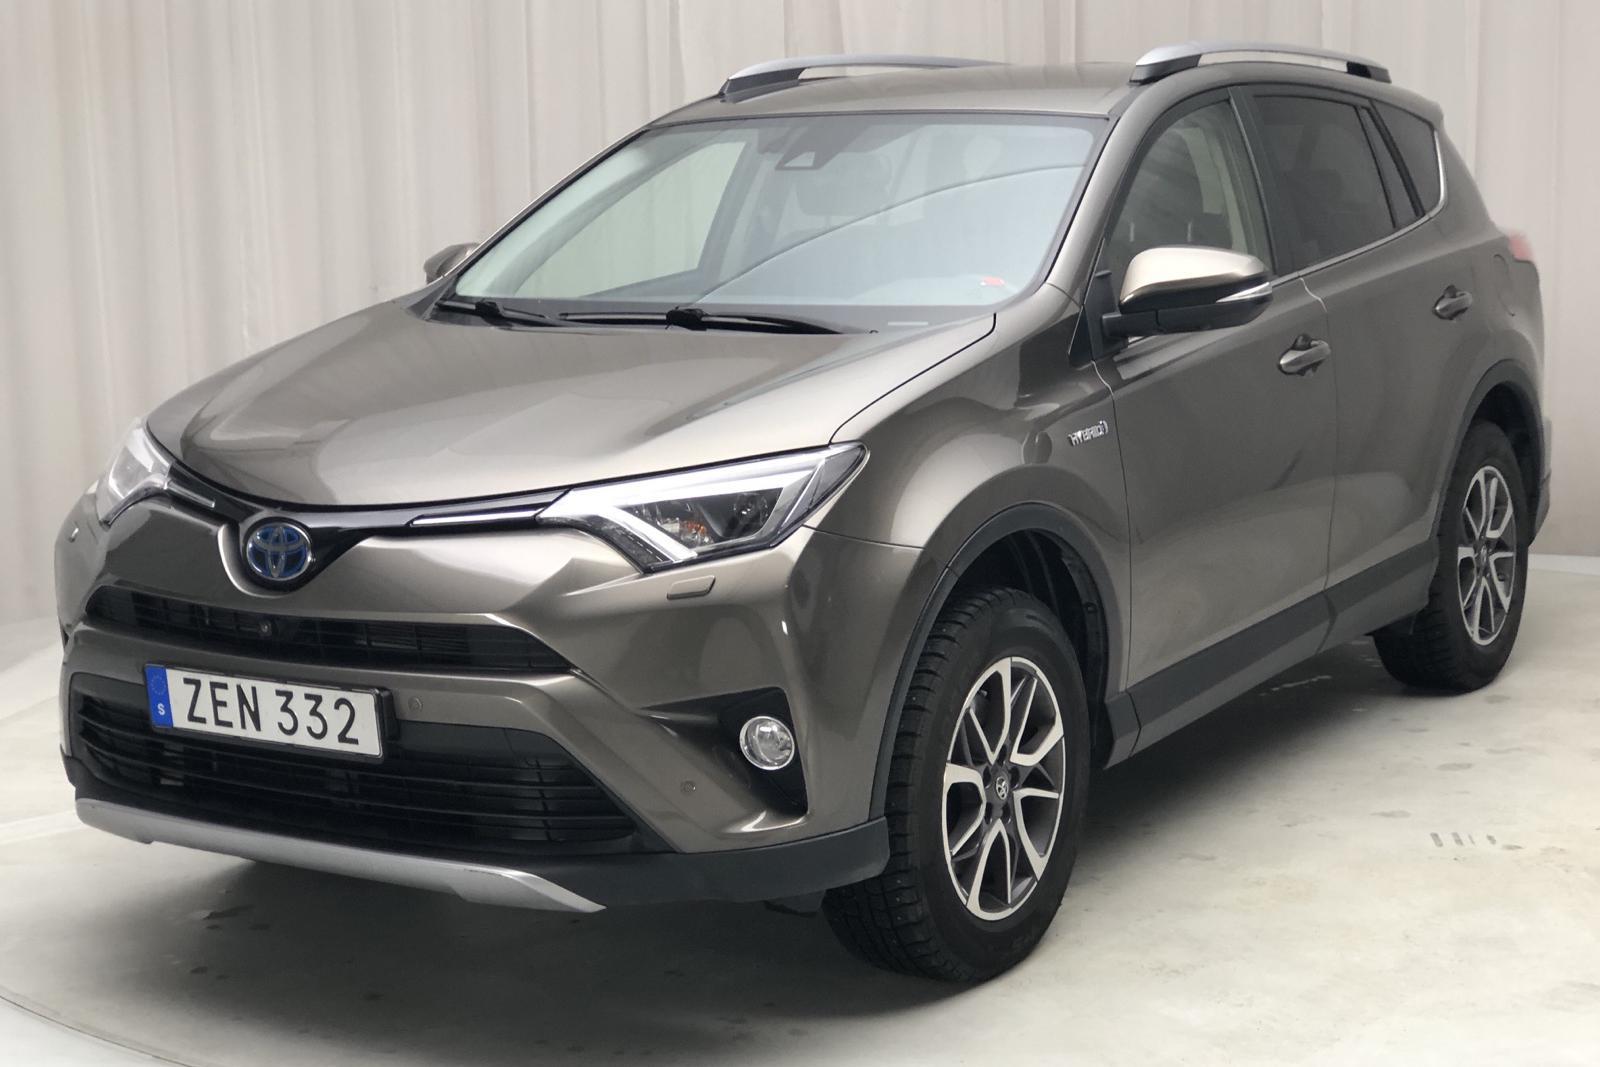 Toyota RAV4 2.5 HSD AWD (197hk) - 40 770 km - Automatic - brown - 2018